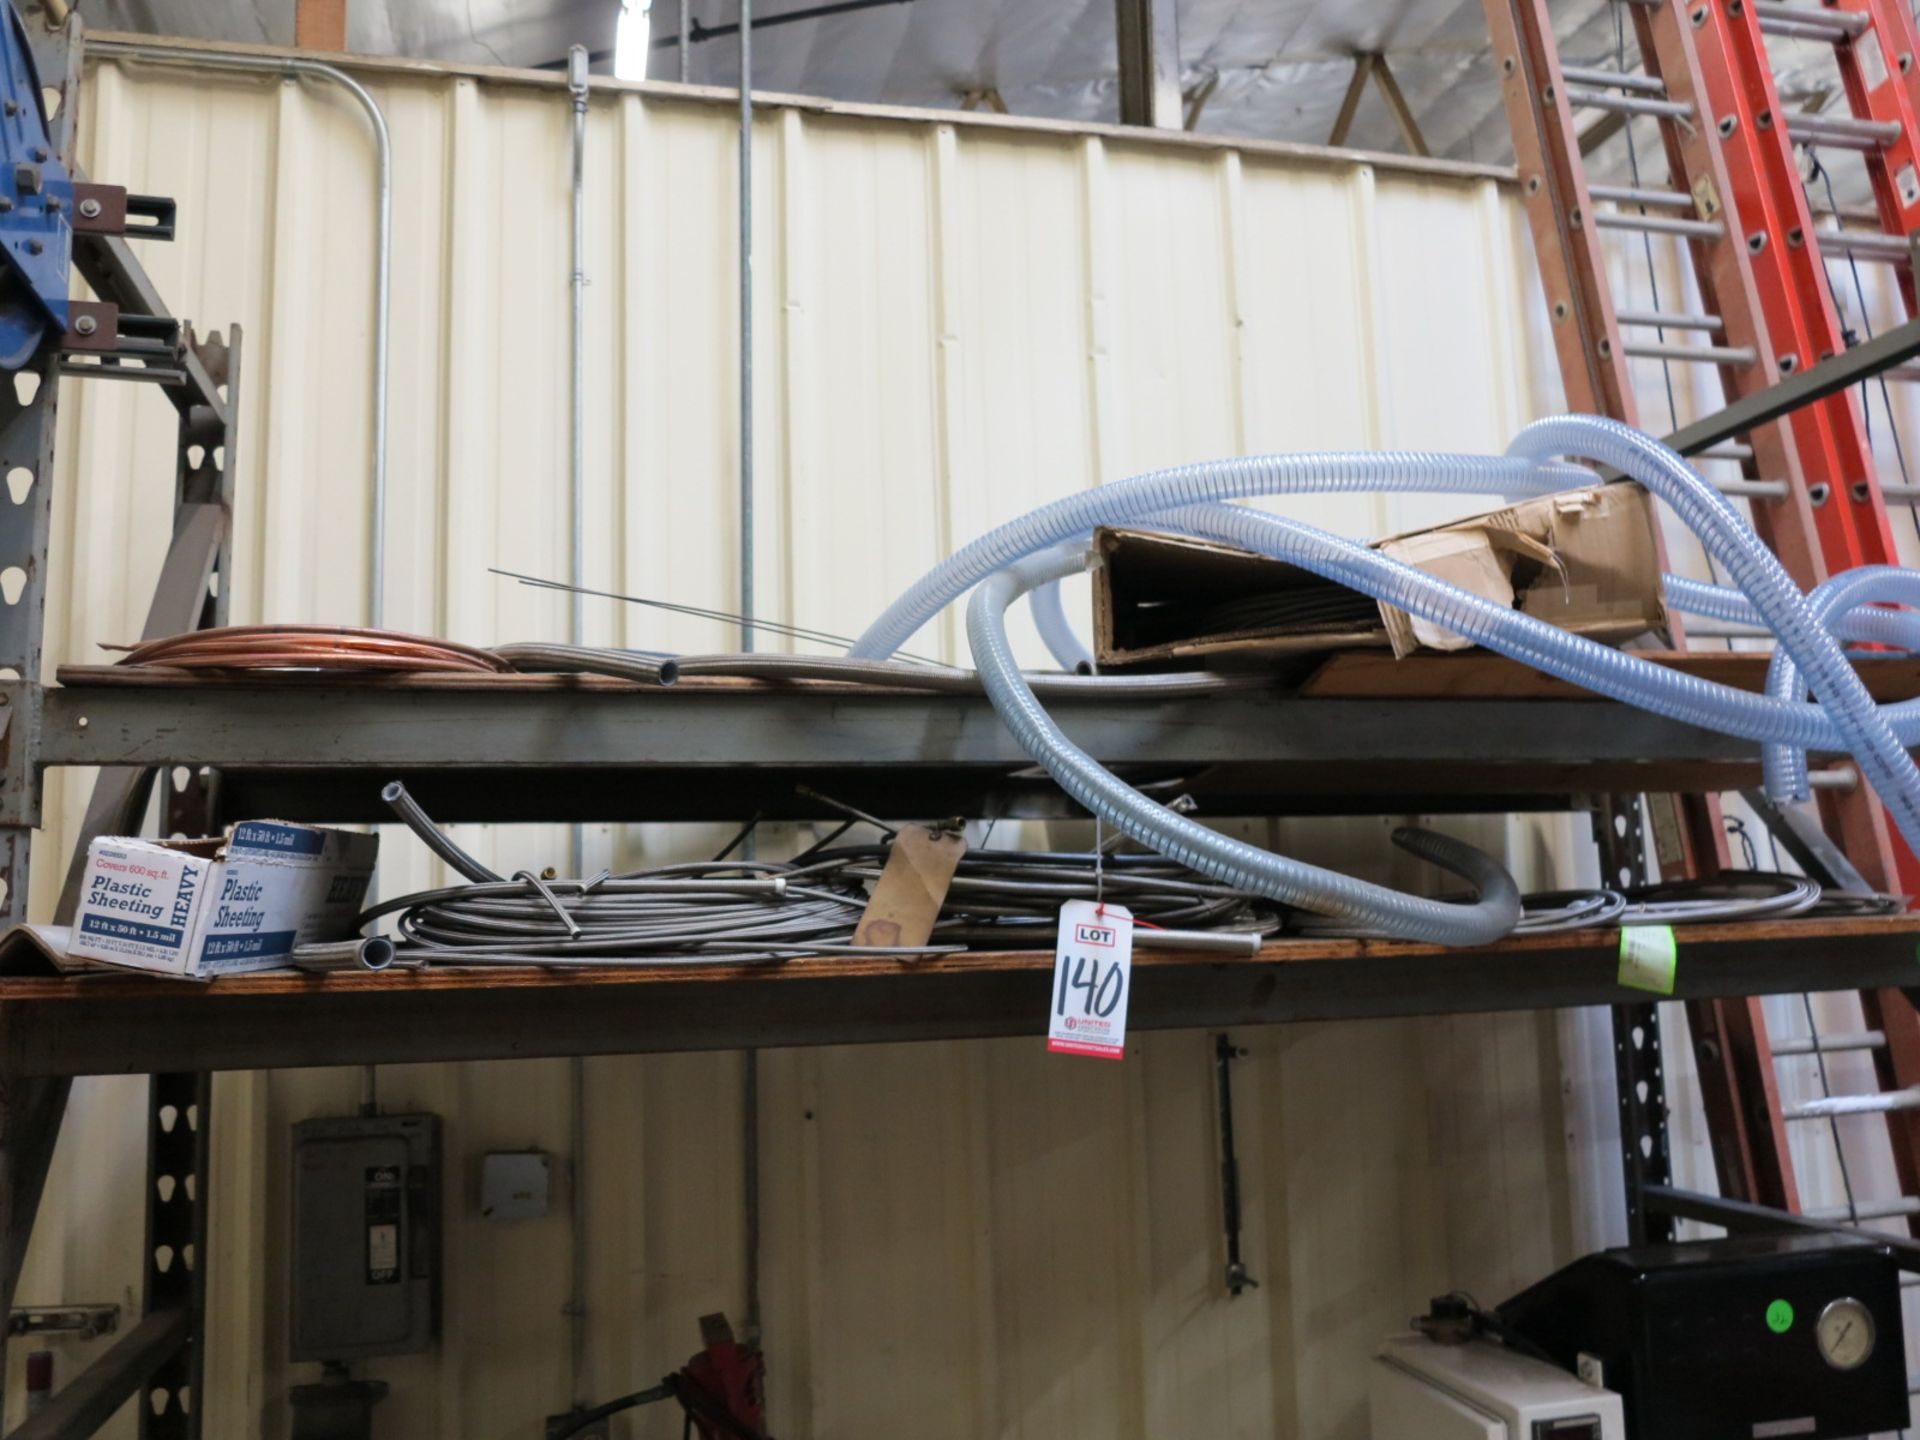 LOT - MISC PLASTIC HOSE, SOFT COPPER TUBING, STEEL BRAIDED HOSE, ETC.